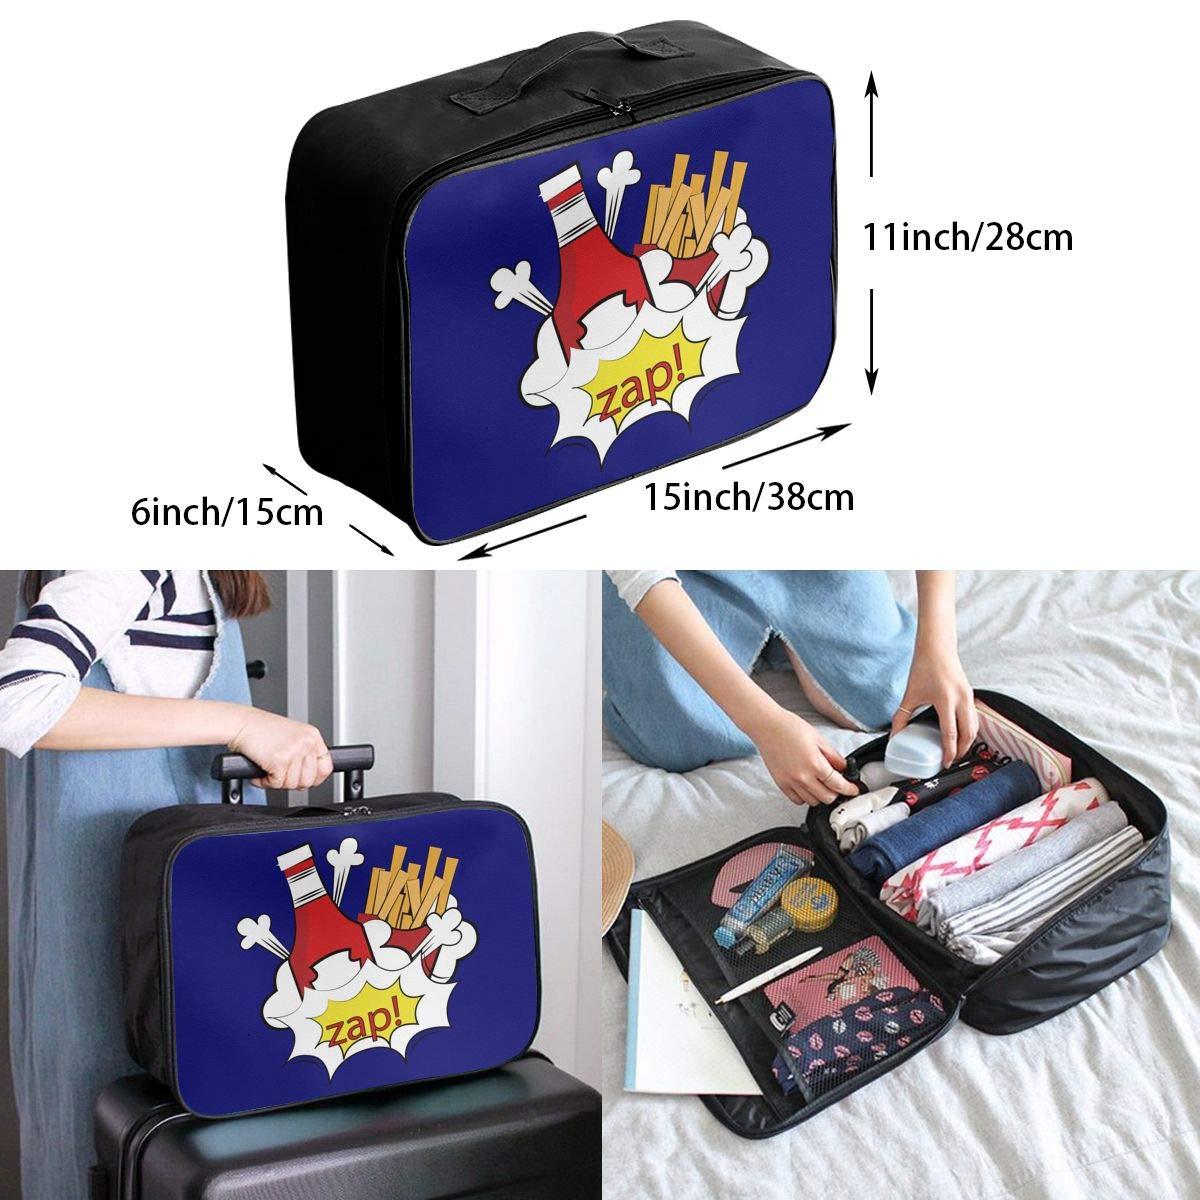 Travel Luggage Duffle Bag Lightweight Portable Handbag French Fries Large Capacity Waterproof Foldable Storage Tote